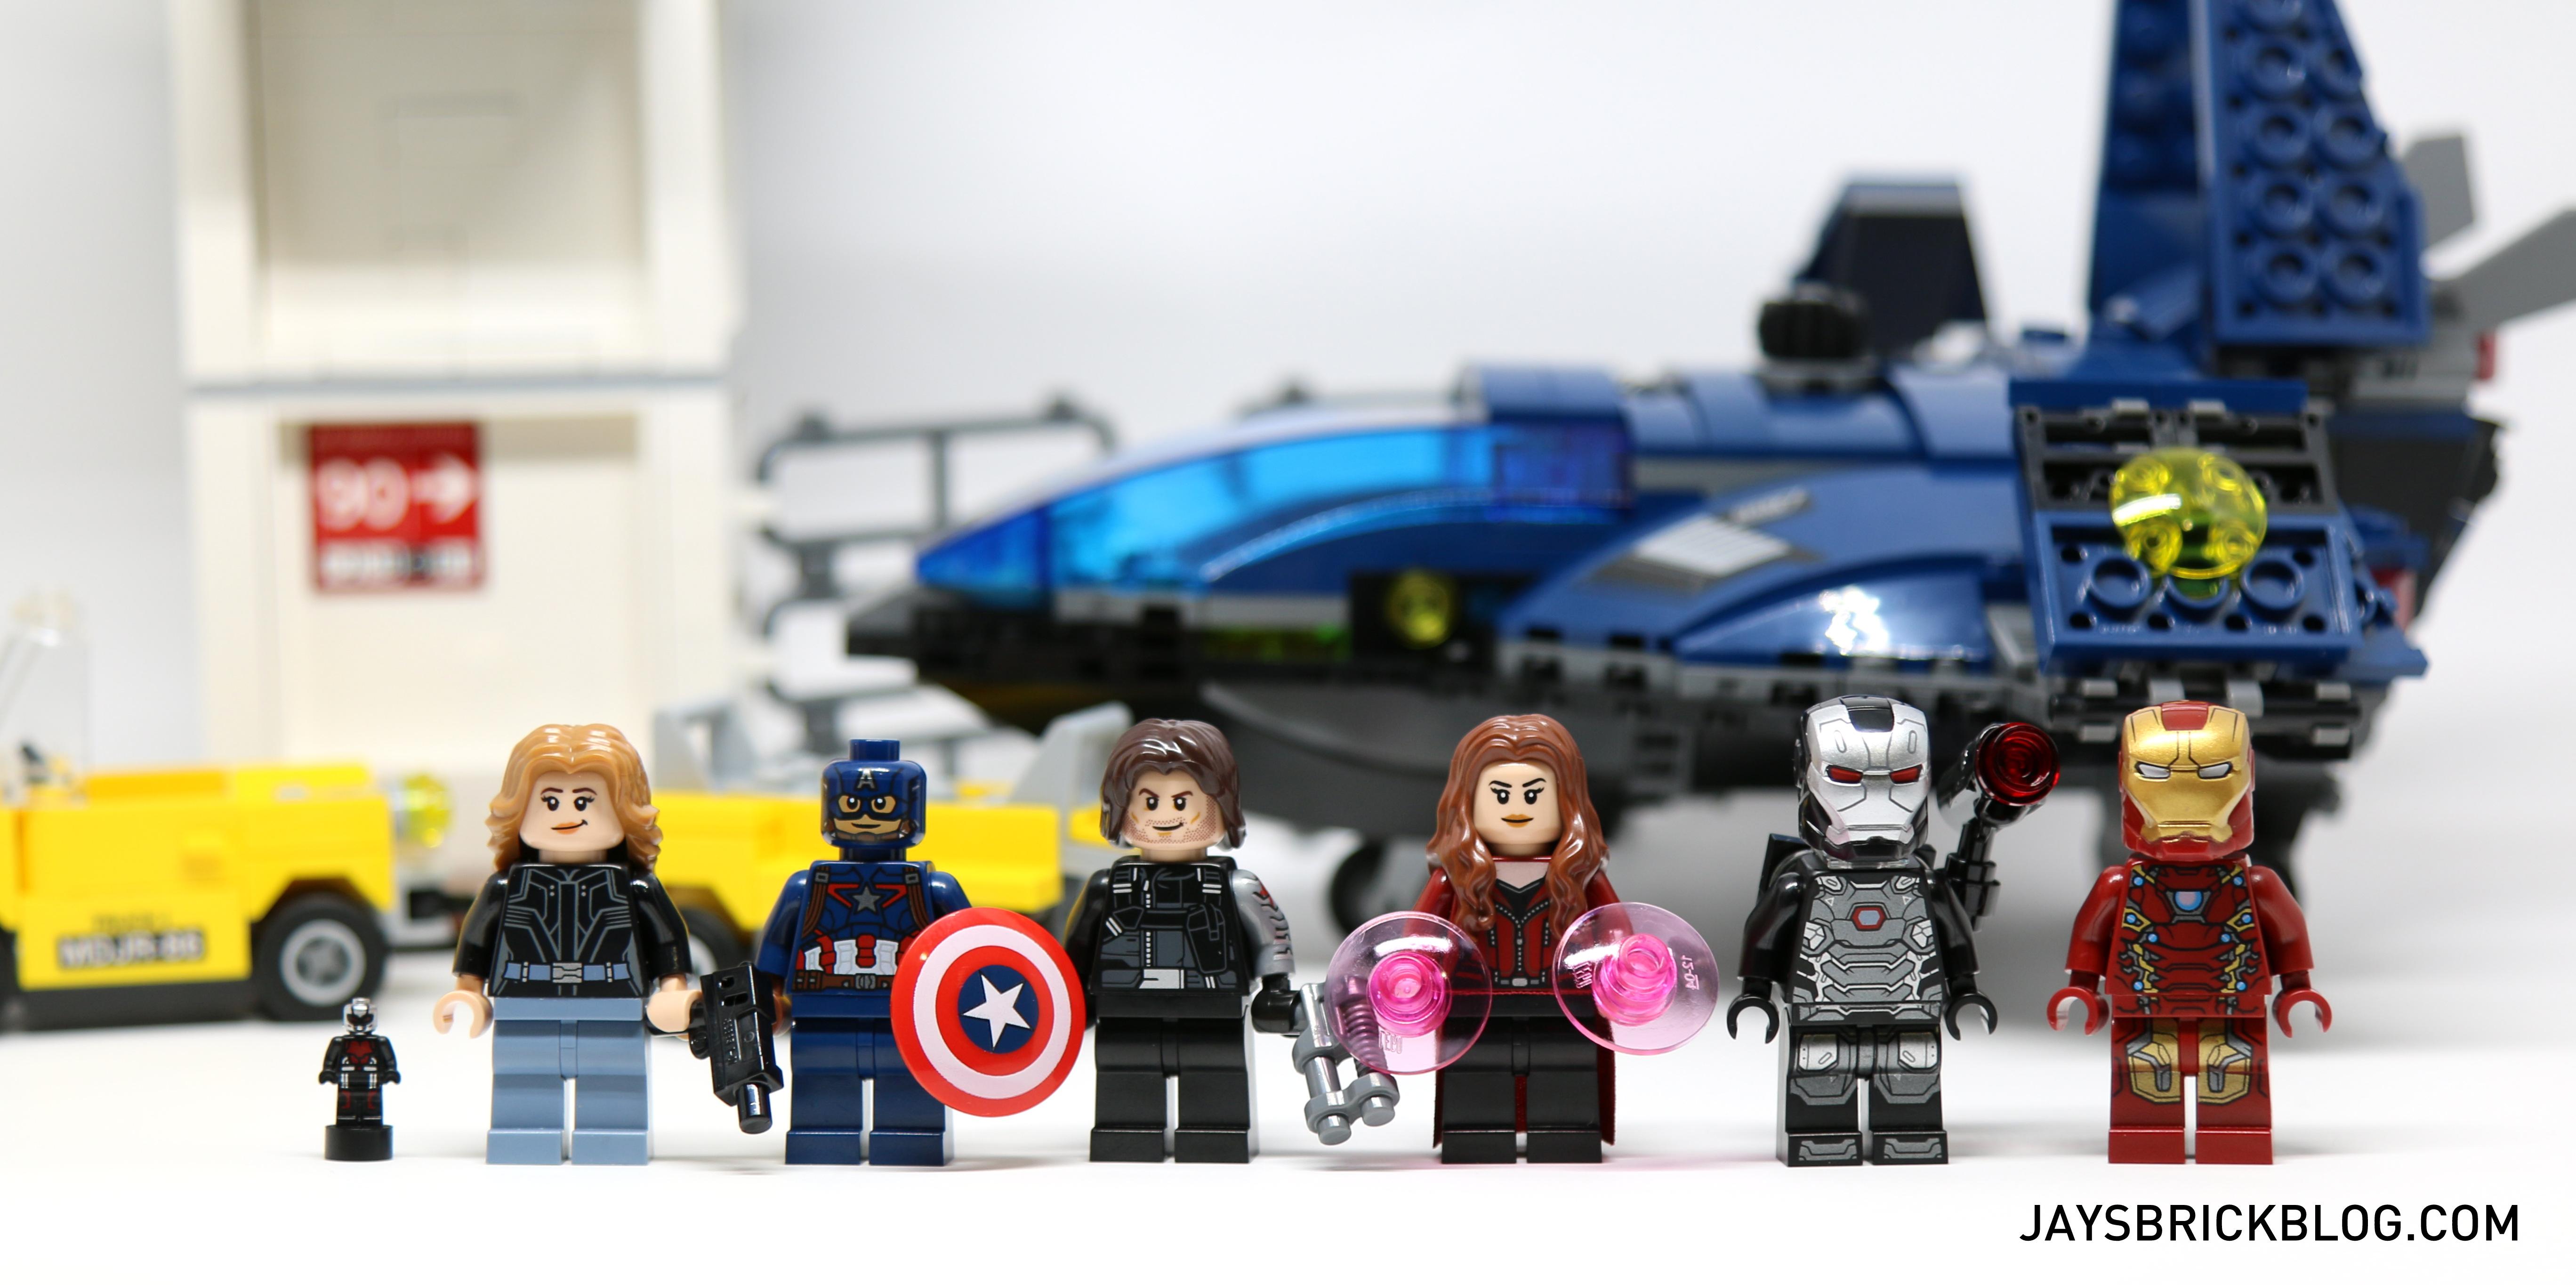 Superheroes Superheroes Sélection Marvel Lego Minifigures Lego Minifigures Marvel TkuXZOPi